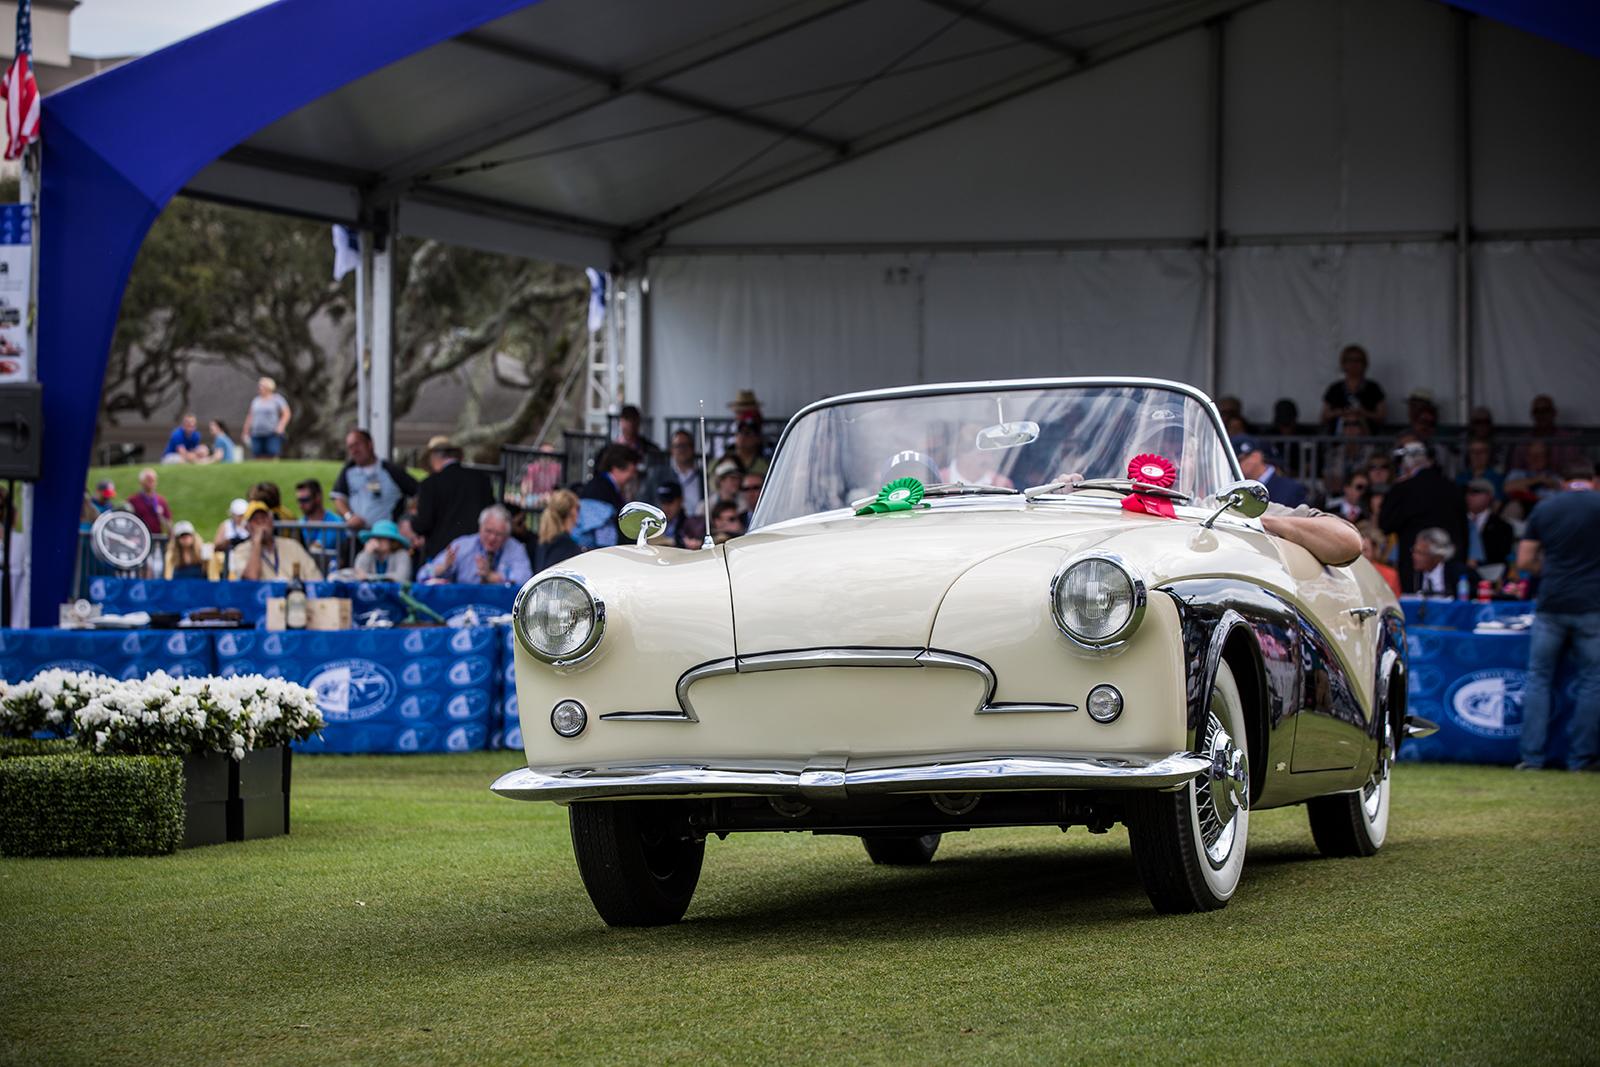 2019 VW - Amelia Concours 100A - Deremer Studios LLC